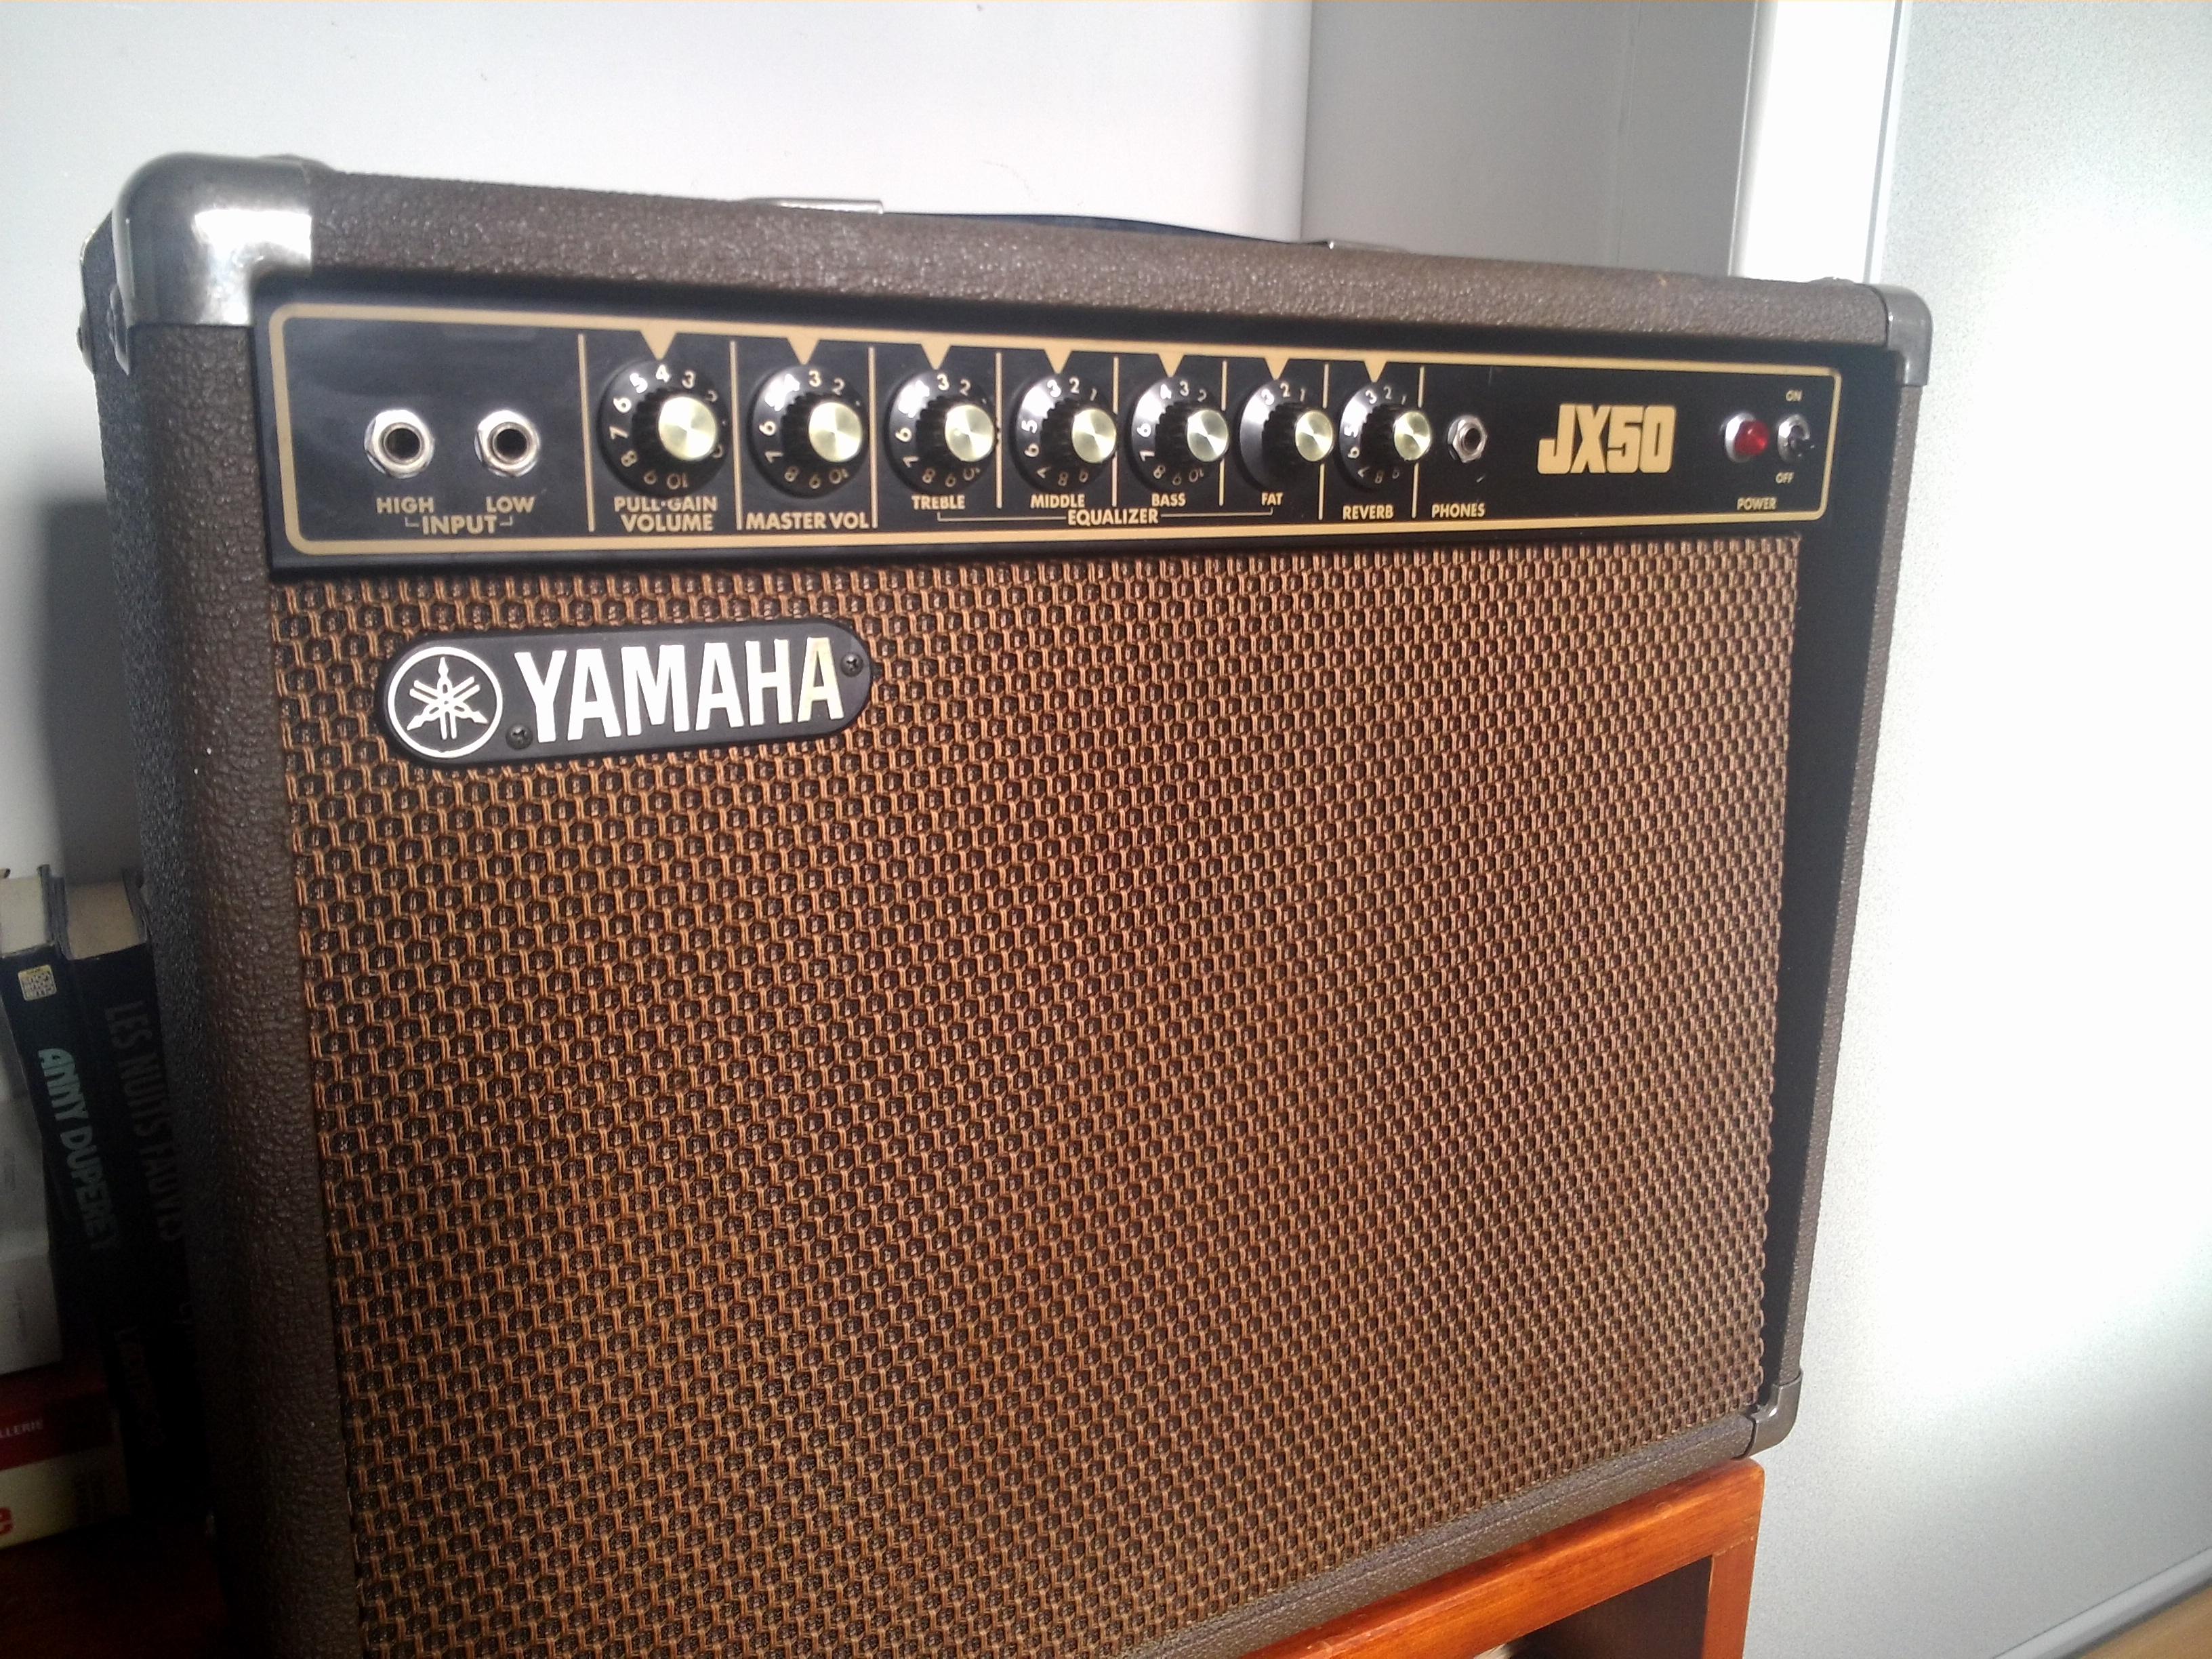 jx50 yamaha jx50 audiofanzine. Black Bedroom Furniture Sets. Home Design Ideas